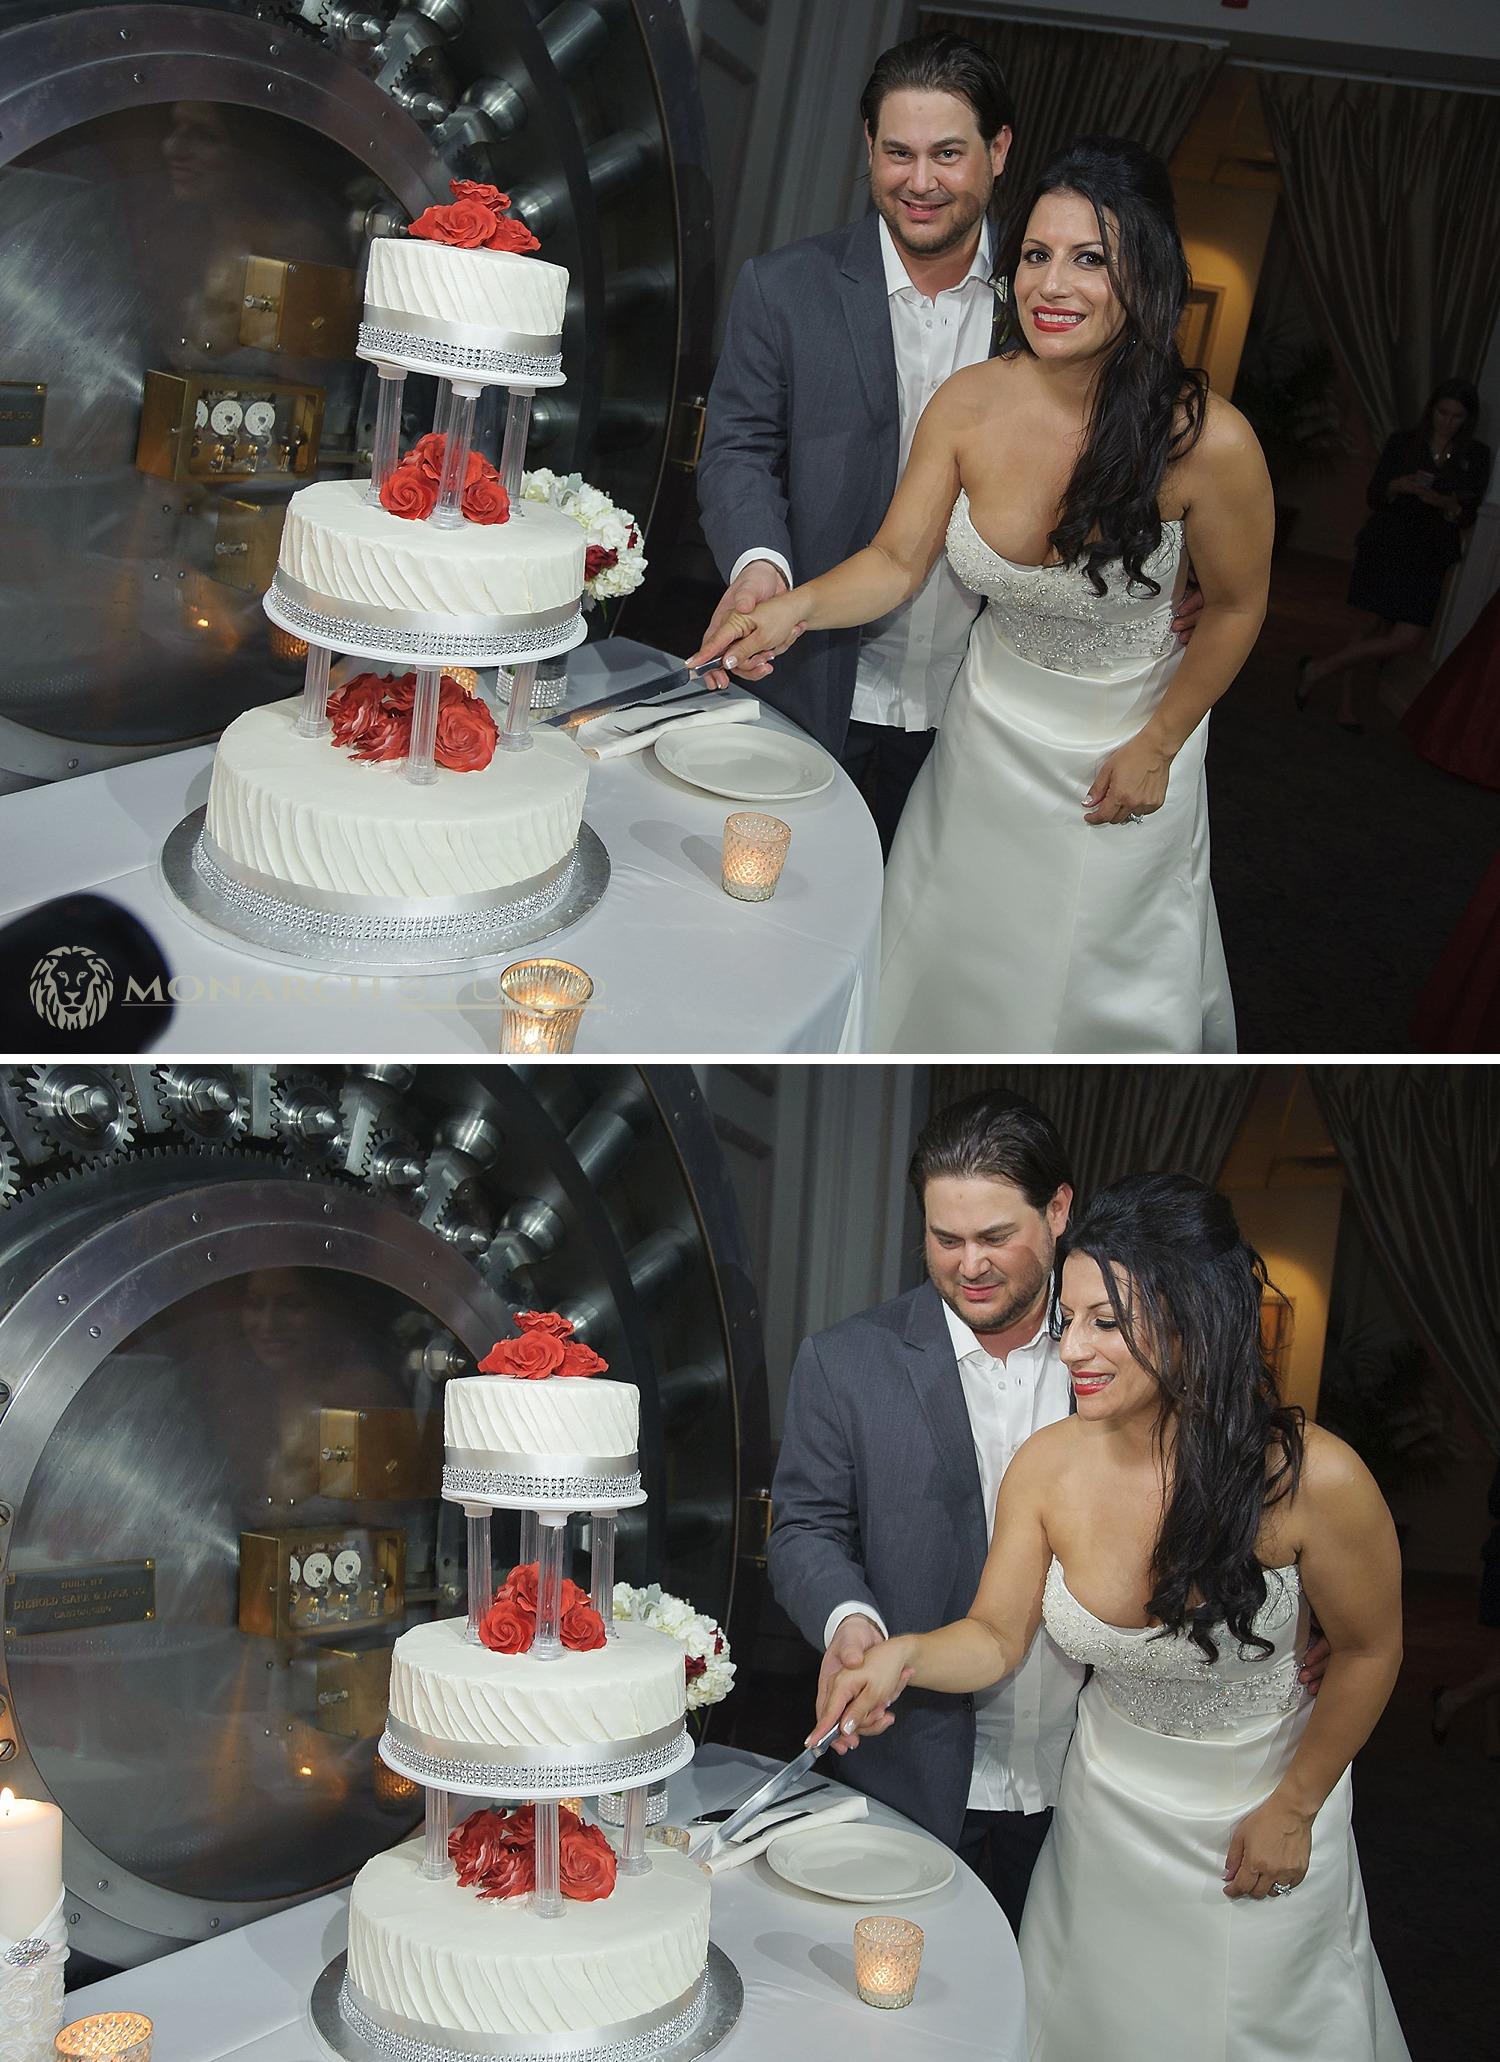 Spanish-Speaking-Wedding-Photographer-St-Augustine-Florida_0055.jpg